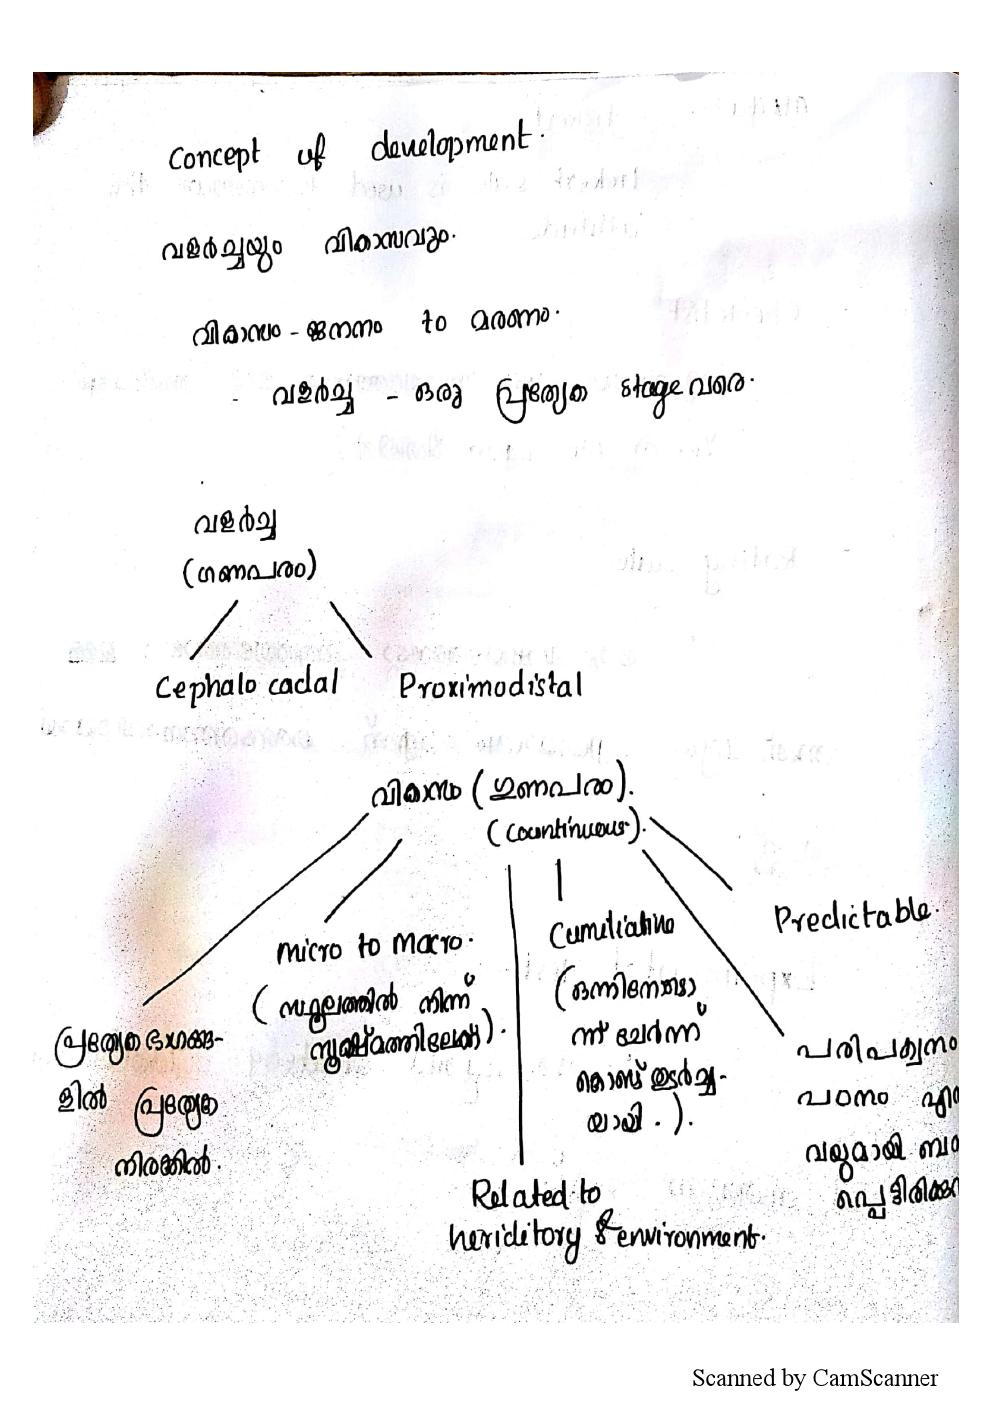 http://masterstudy.net/pdf/ktet_notes0006.png